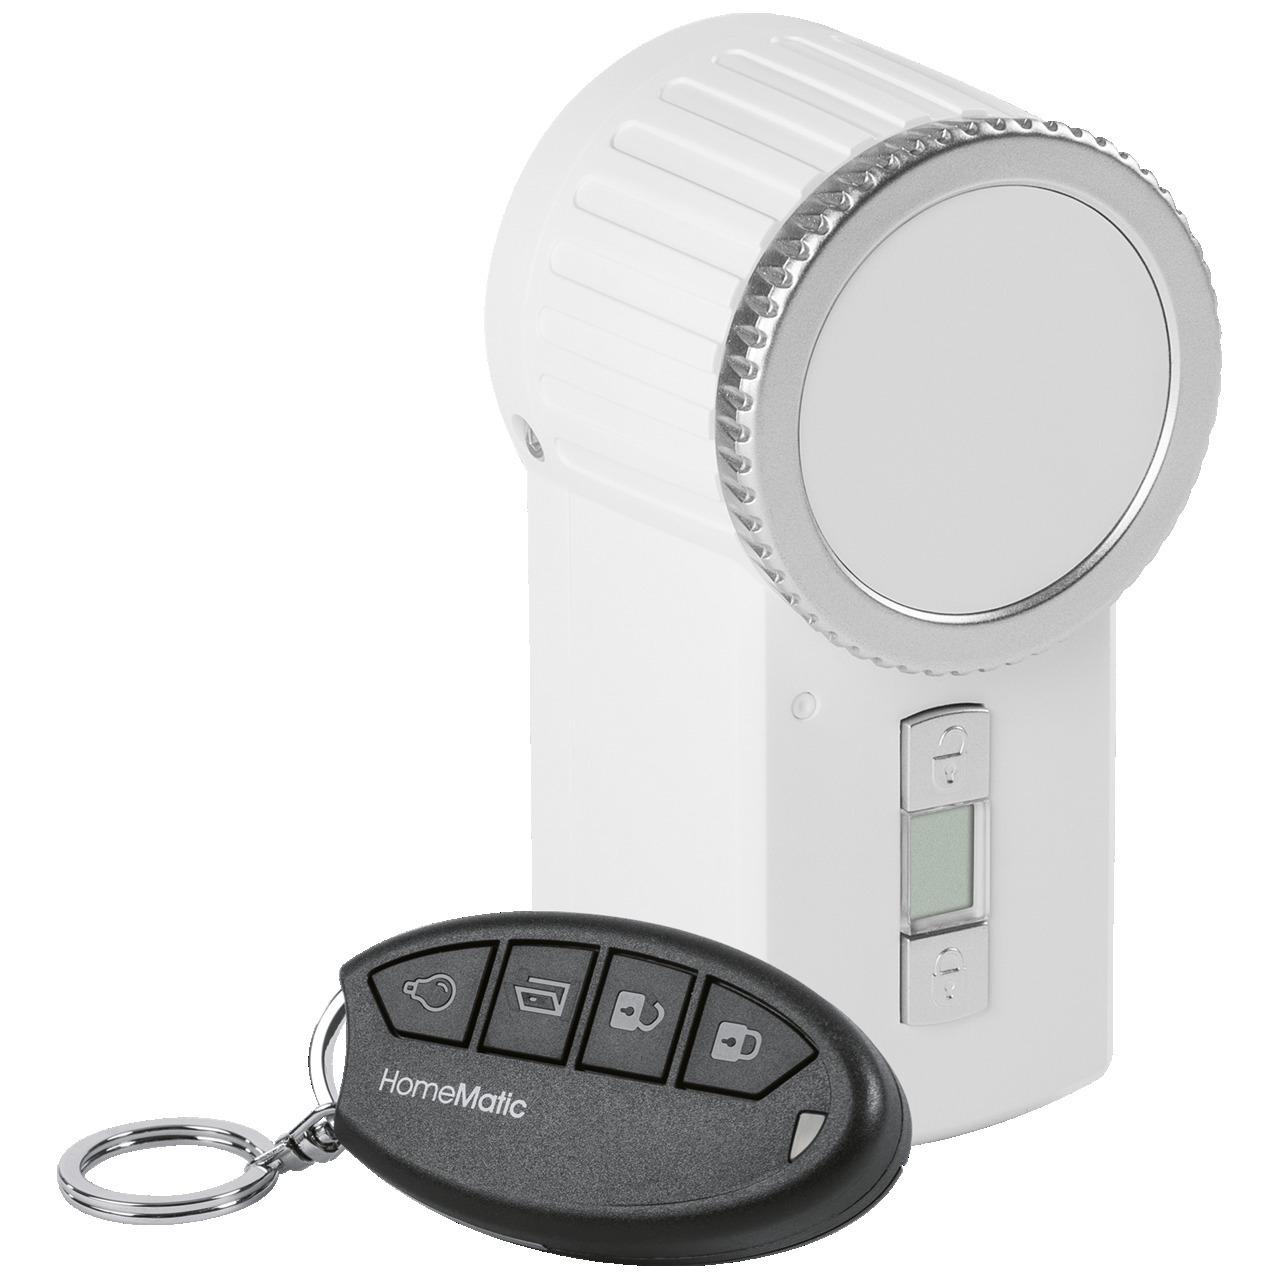 Homematic Funk-Türschlossantrieb KeyMatic- weiss inkl. Funk-Handsender HM-Sec-Key